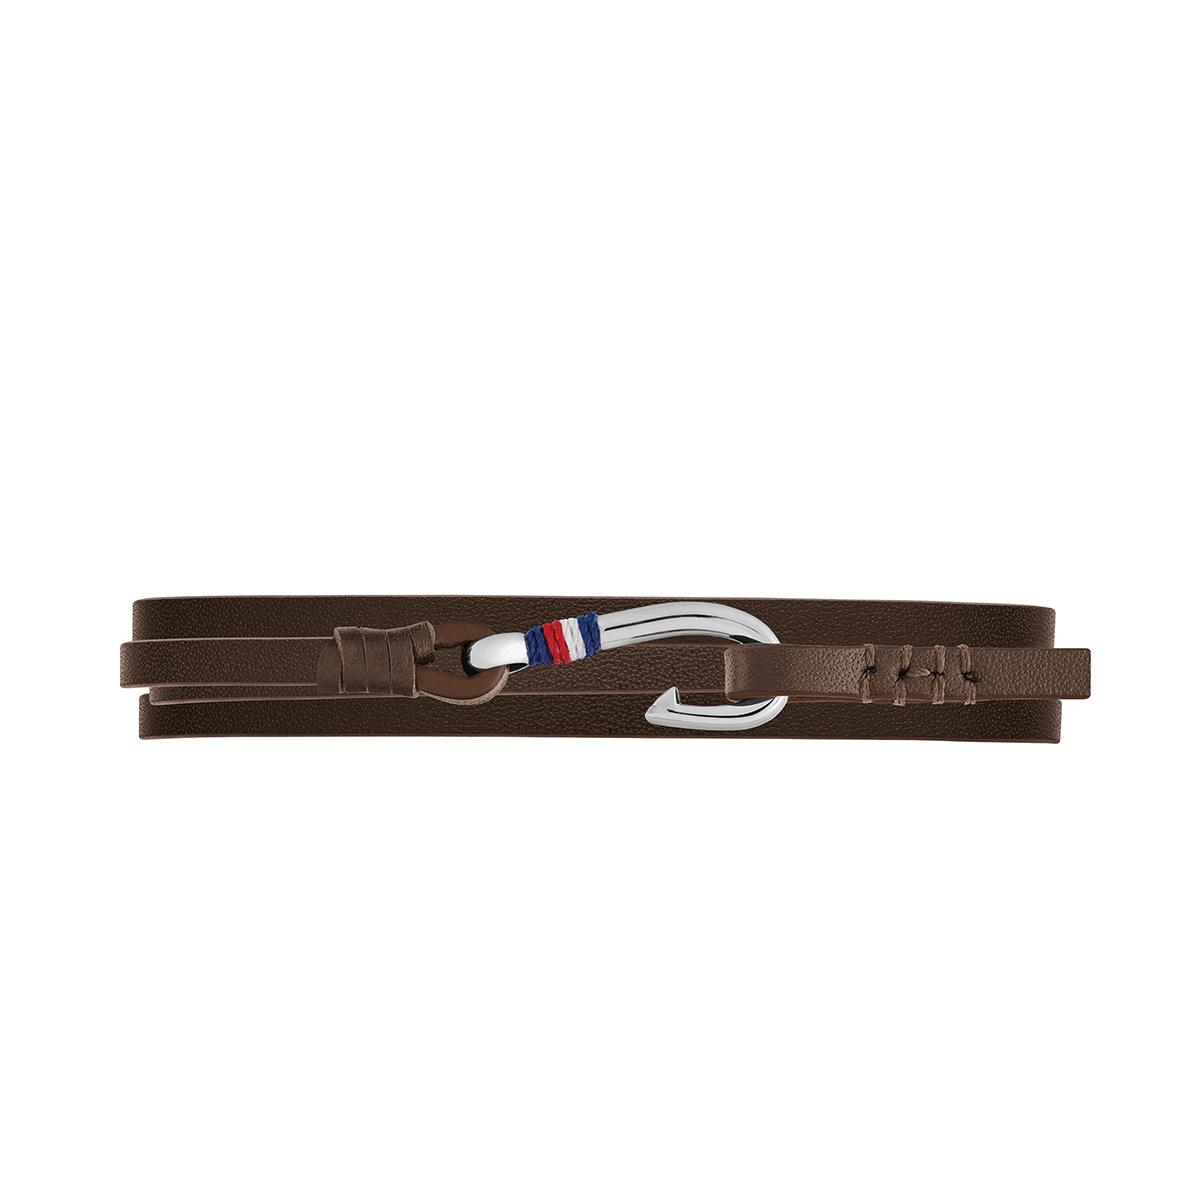 Denim bracelet TJ2790191S (Taille: 19.50 cm) - Tommy hilfiger - Modalova